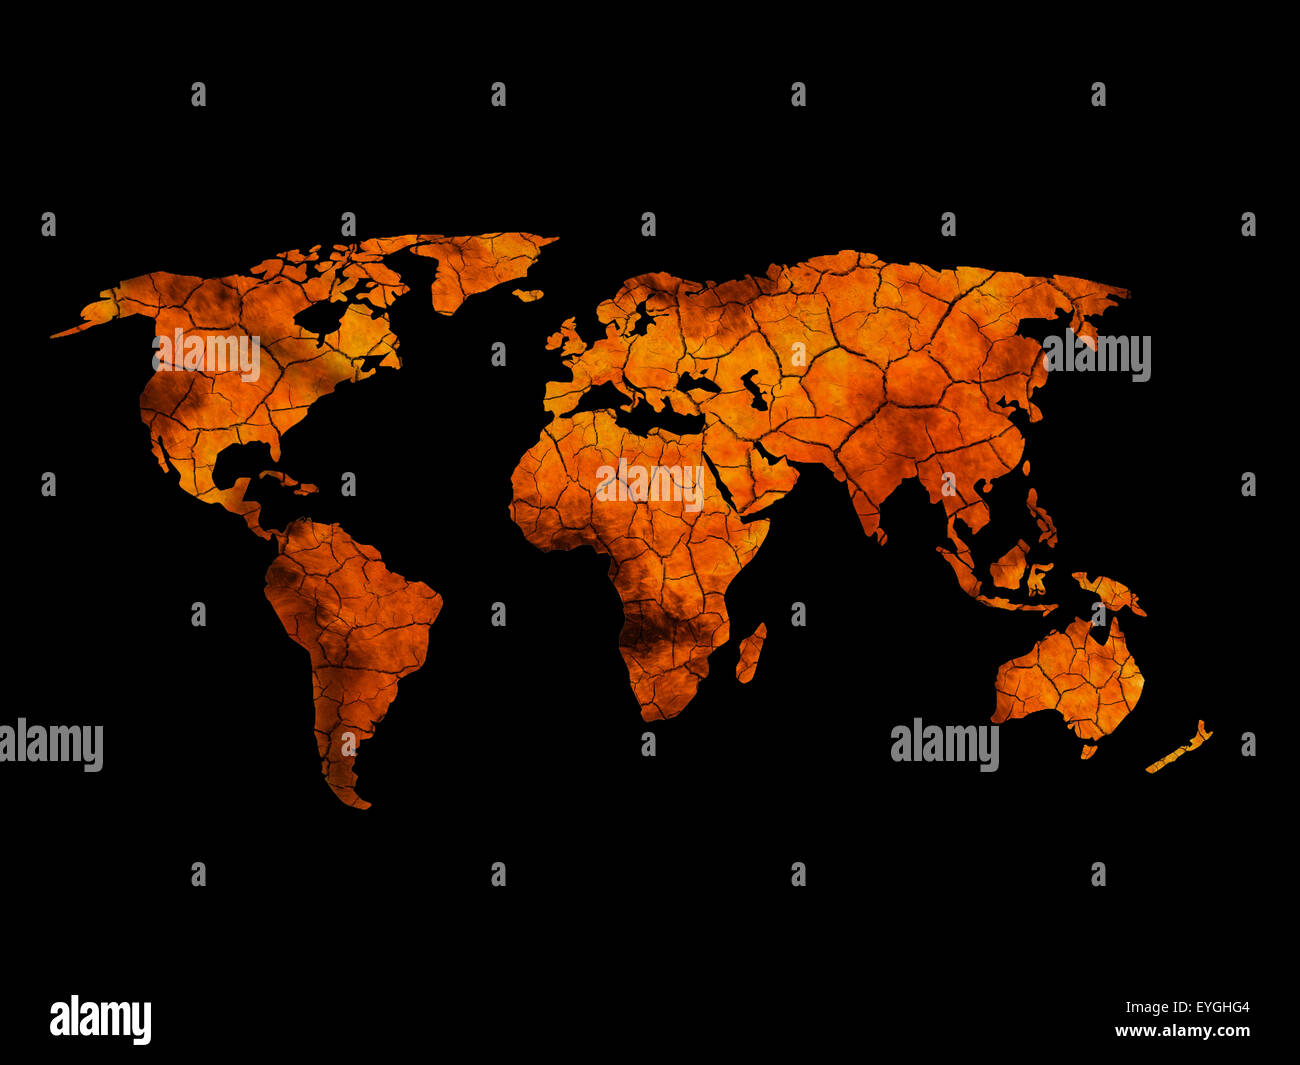 12.2005 et de terre brûlée carte du monde. Photo Stock